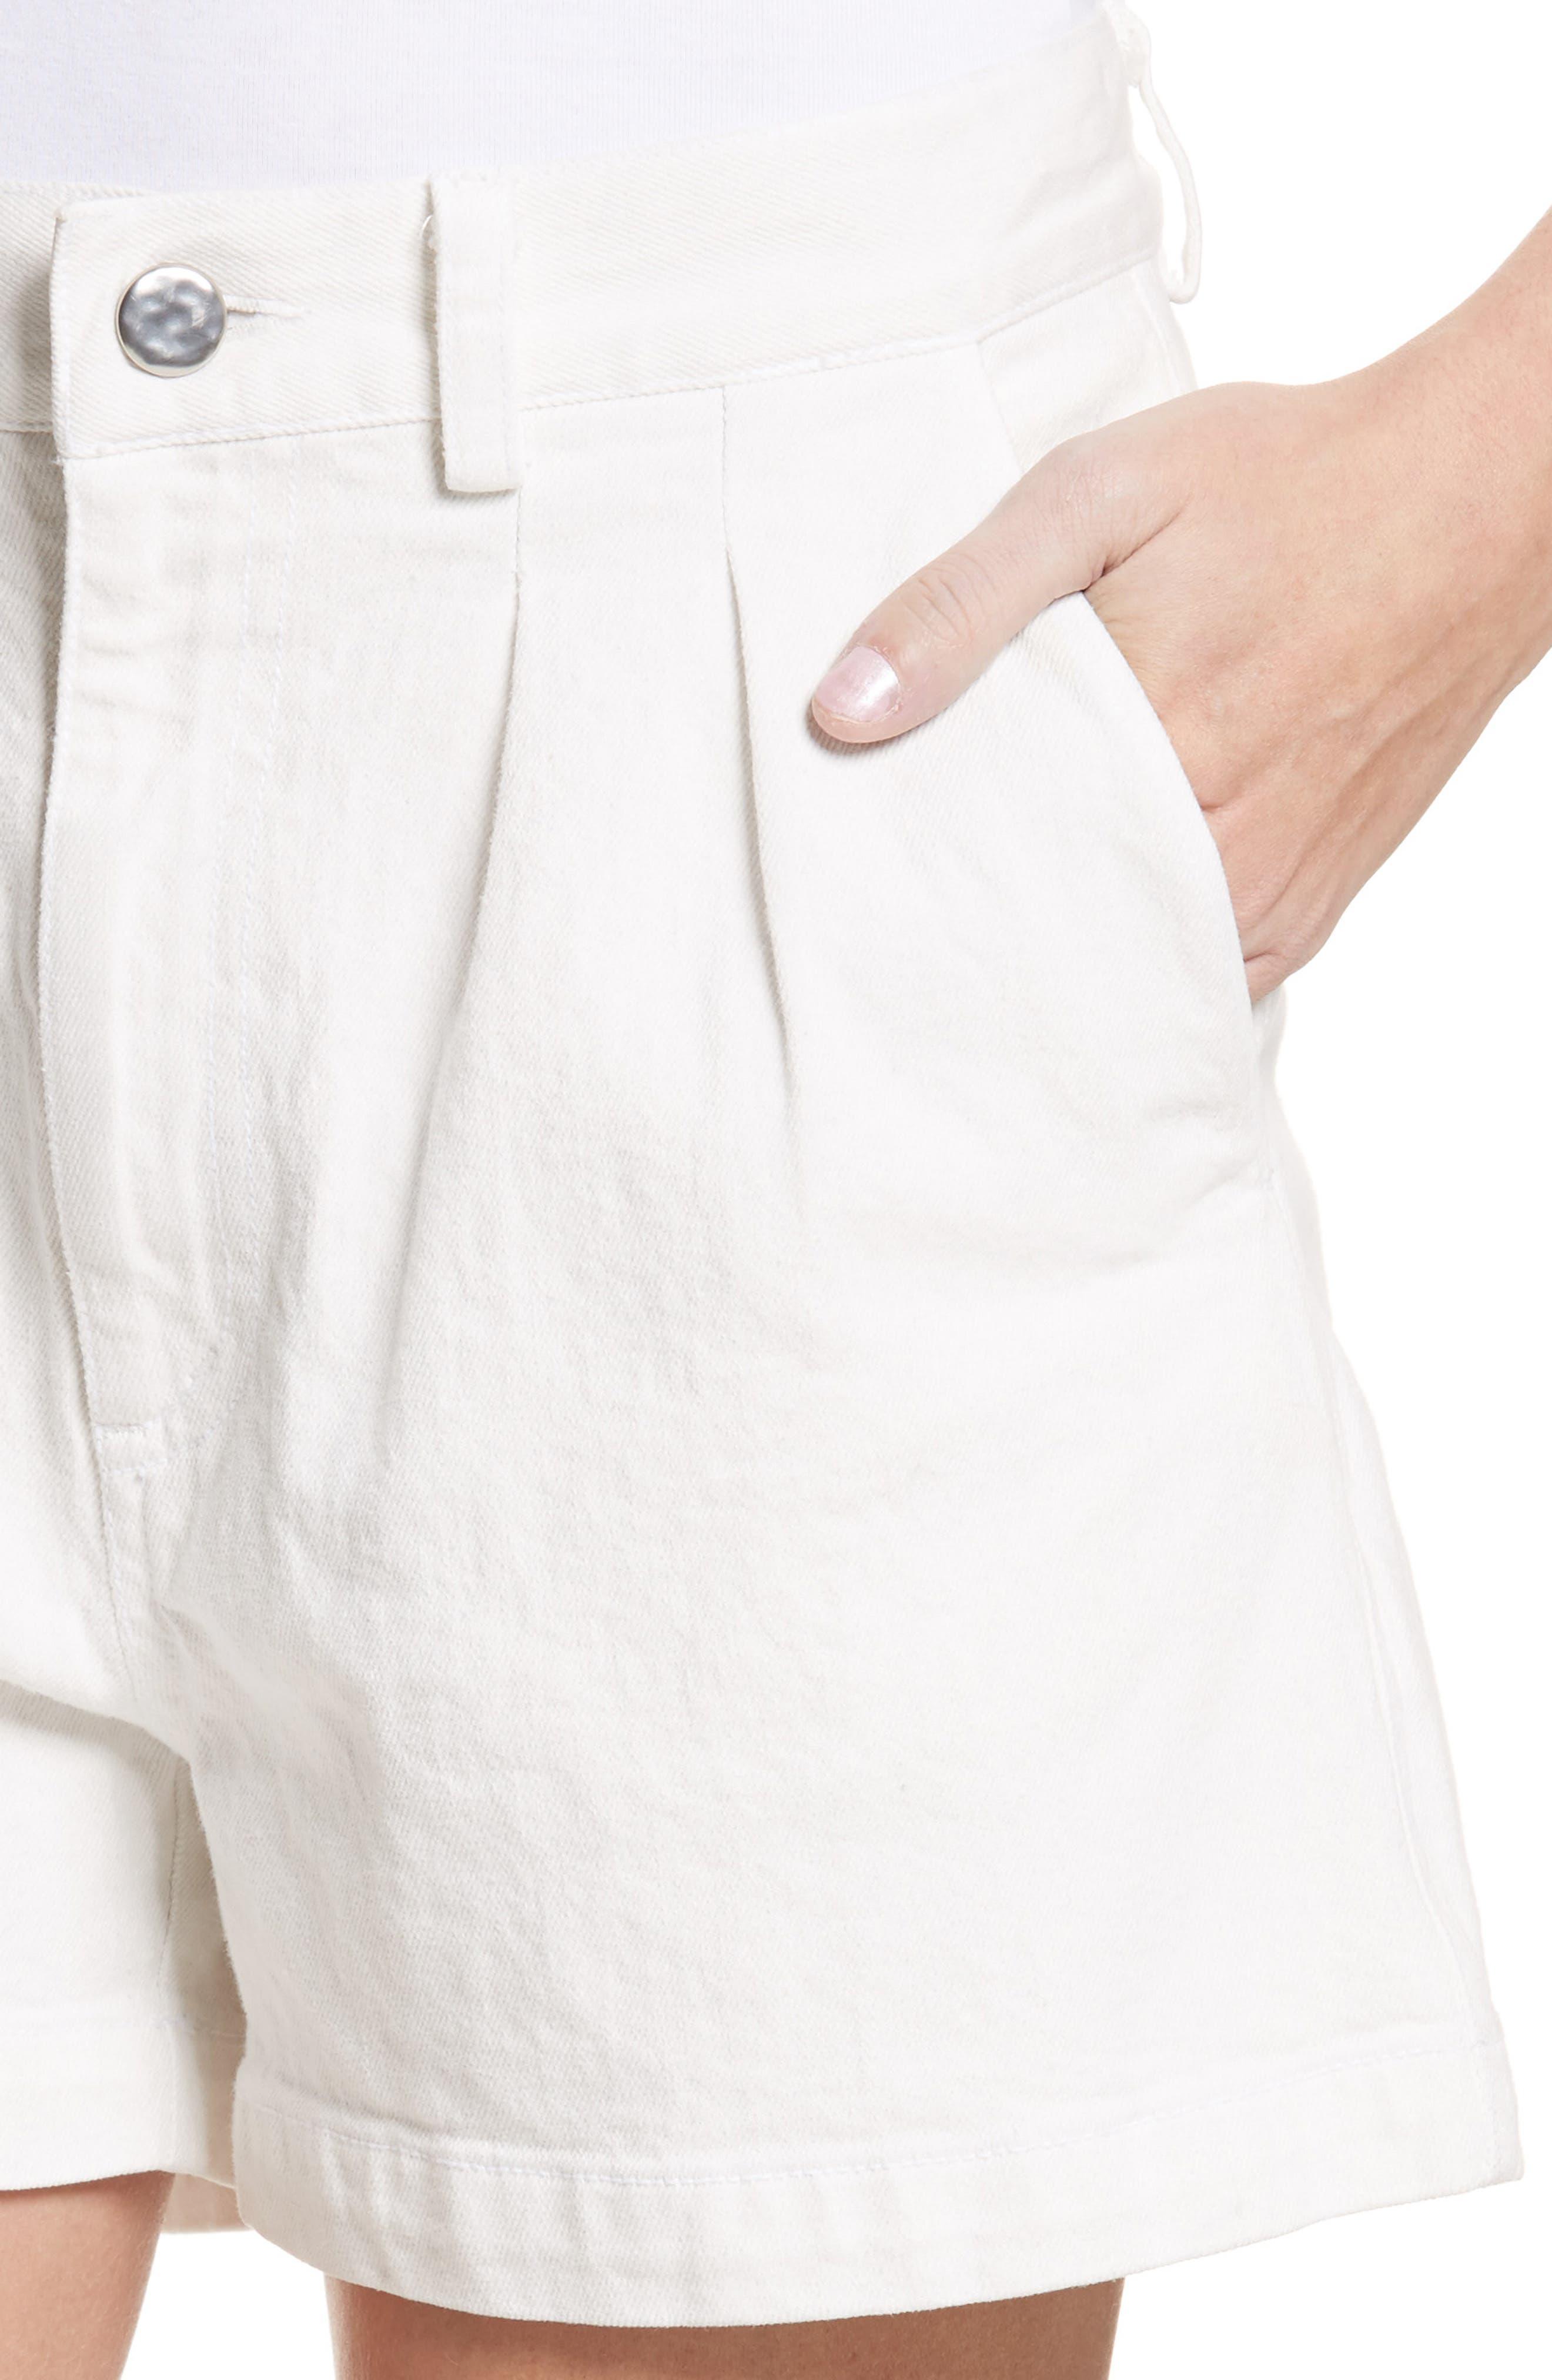 Daft Denim Shorts,                             Alternate thumbnail 4, color,                             Dirty White